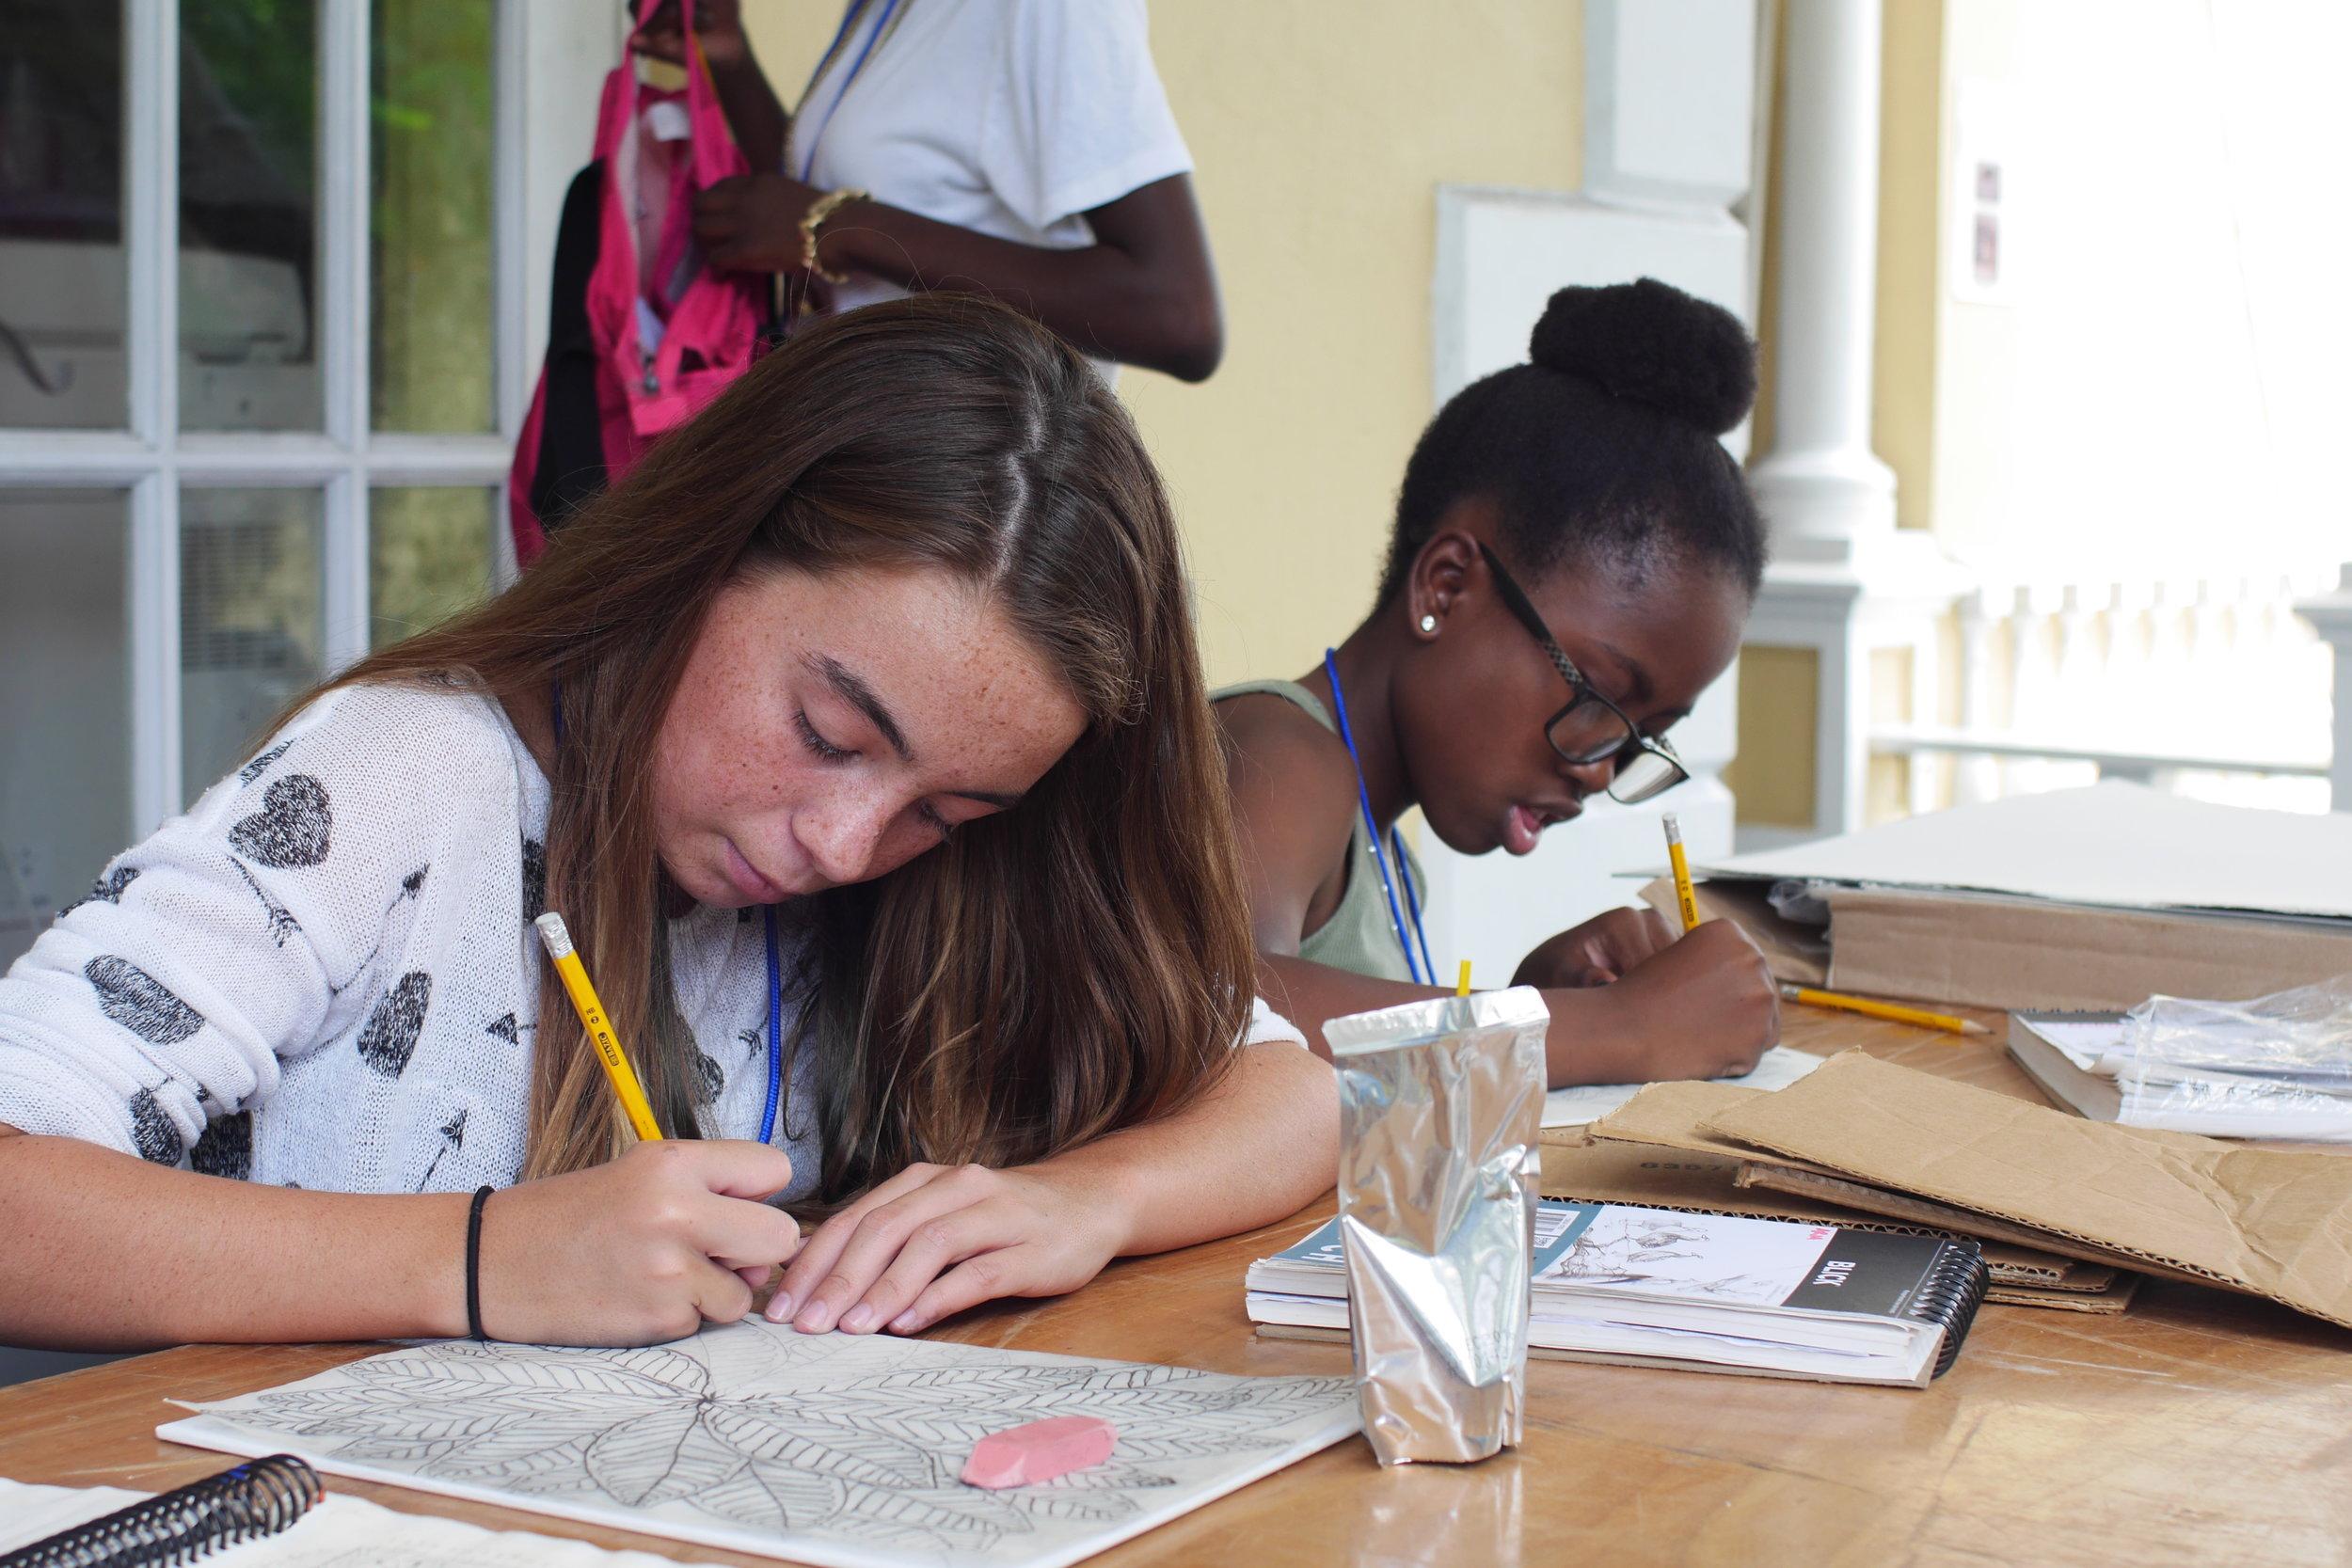 Eliana and Tamina working on their drawings at MMSAC 2016.